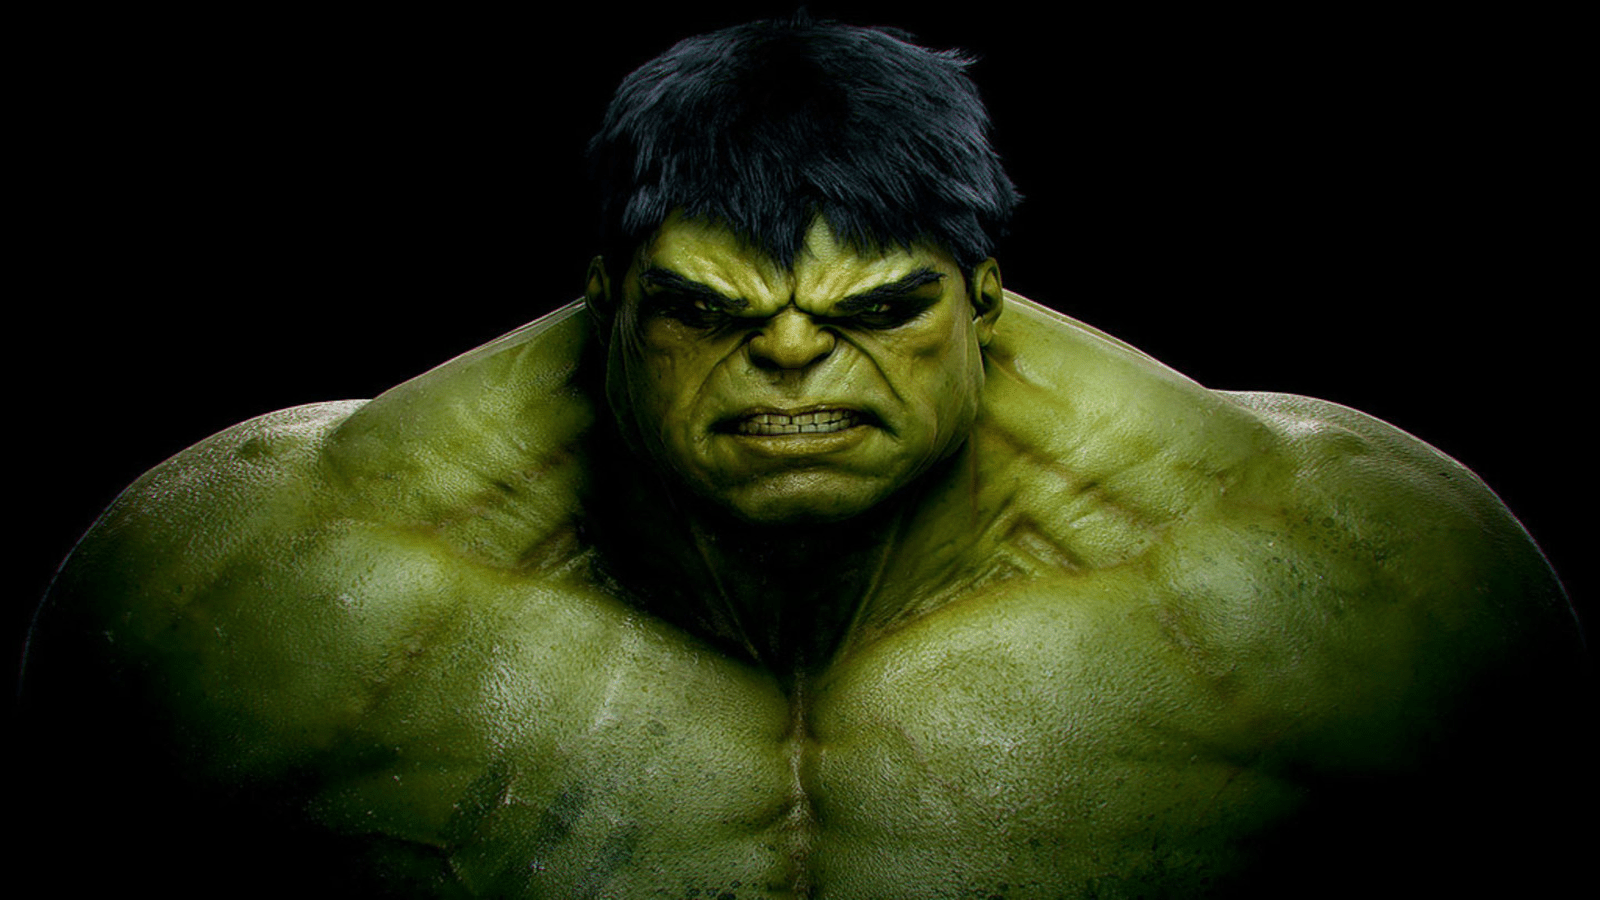 Ultra Hd 4k 8k Fine Hulk Man Hulk Movie Hulk Marvel Incredible Hulk